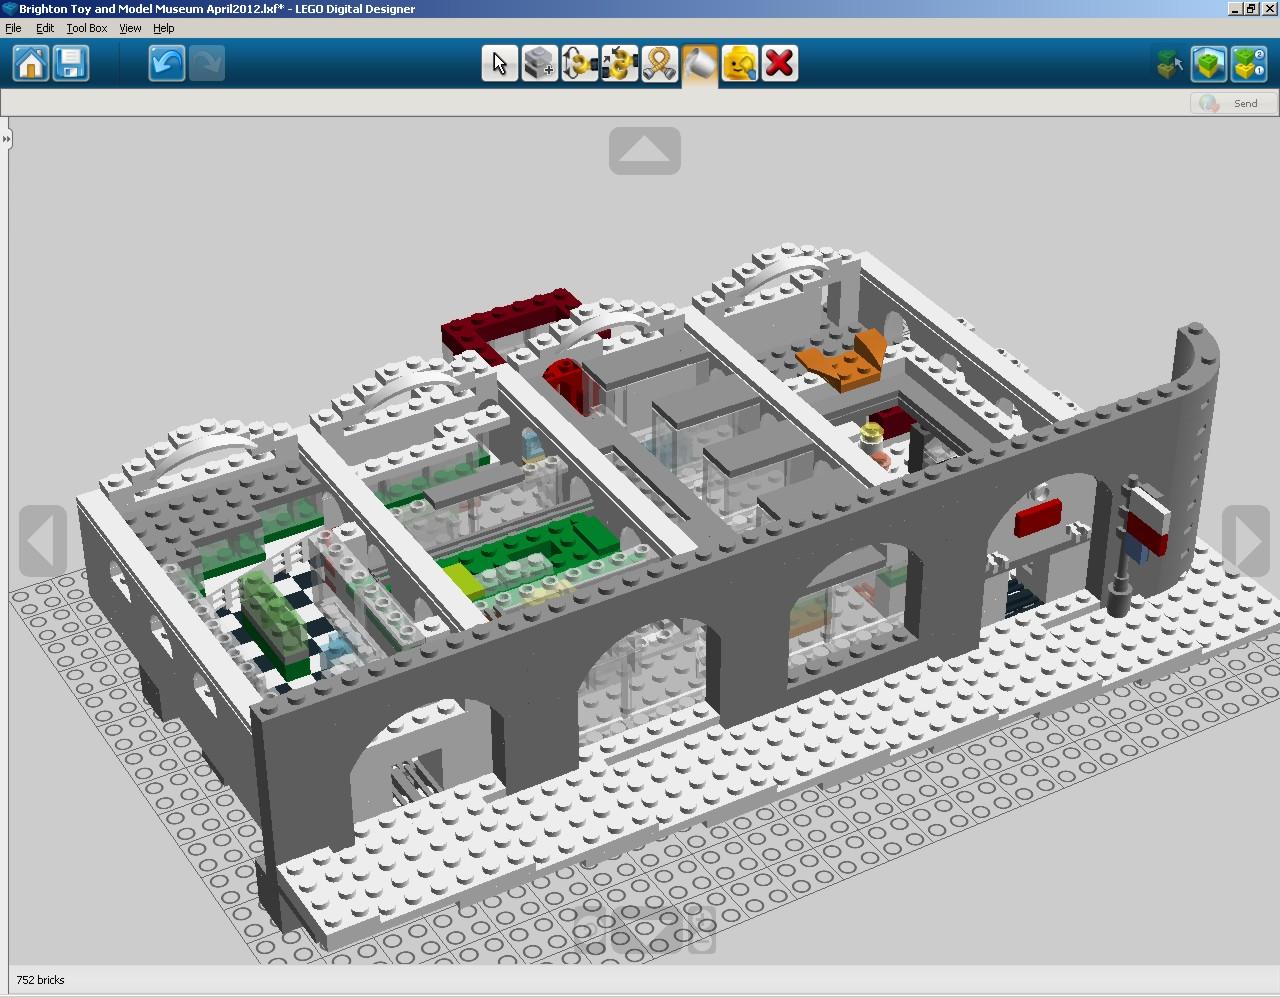 Categorylego digital designer ldd the brighton toy and model brighton toy and model museum constructed as a virtual lego model pronofoot35fo Images